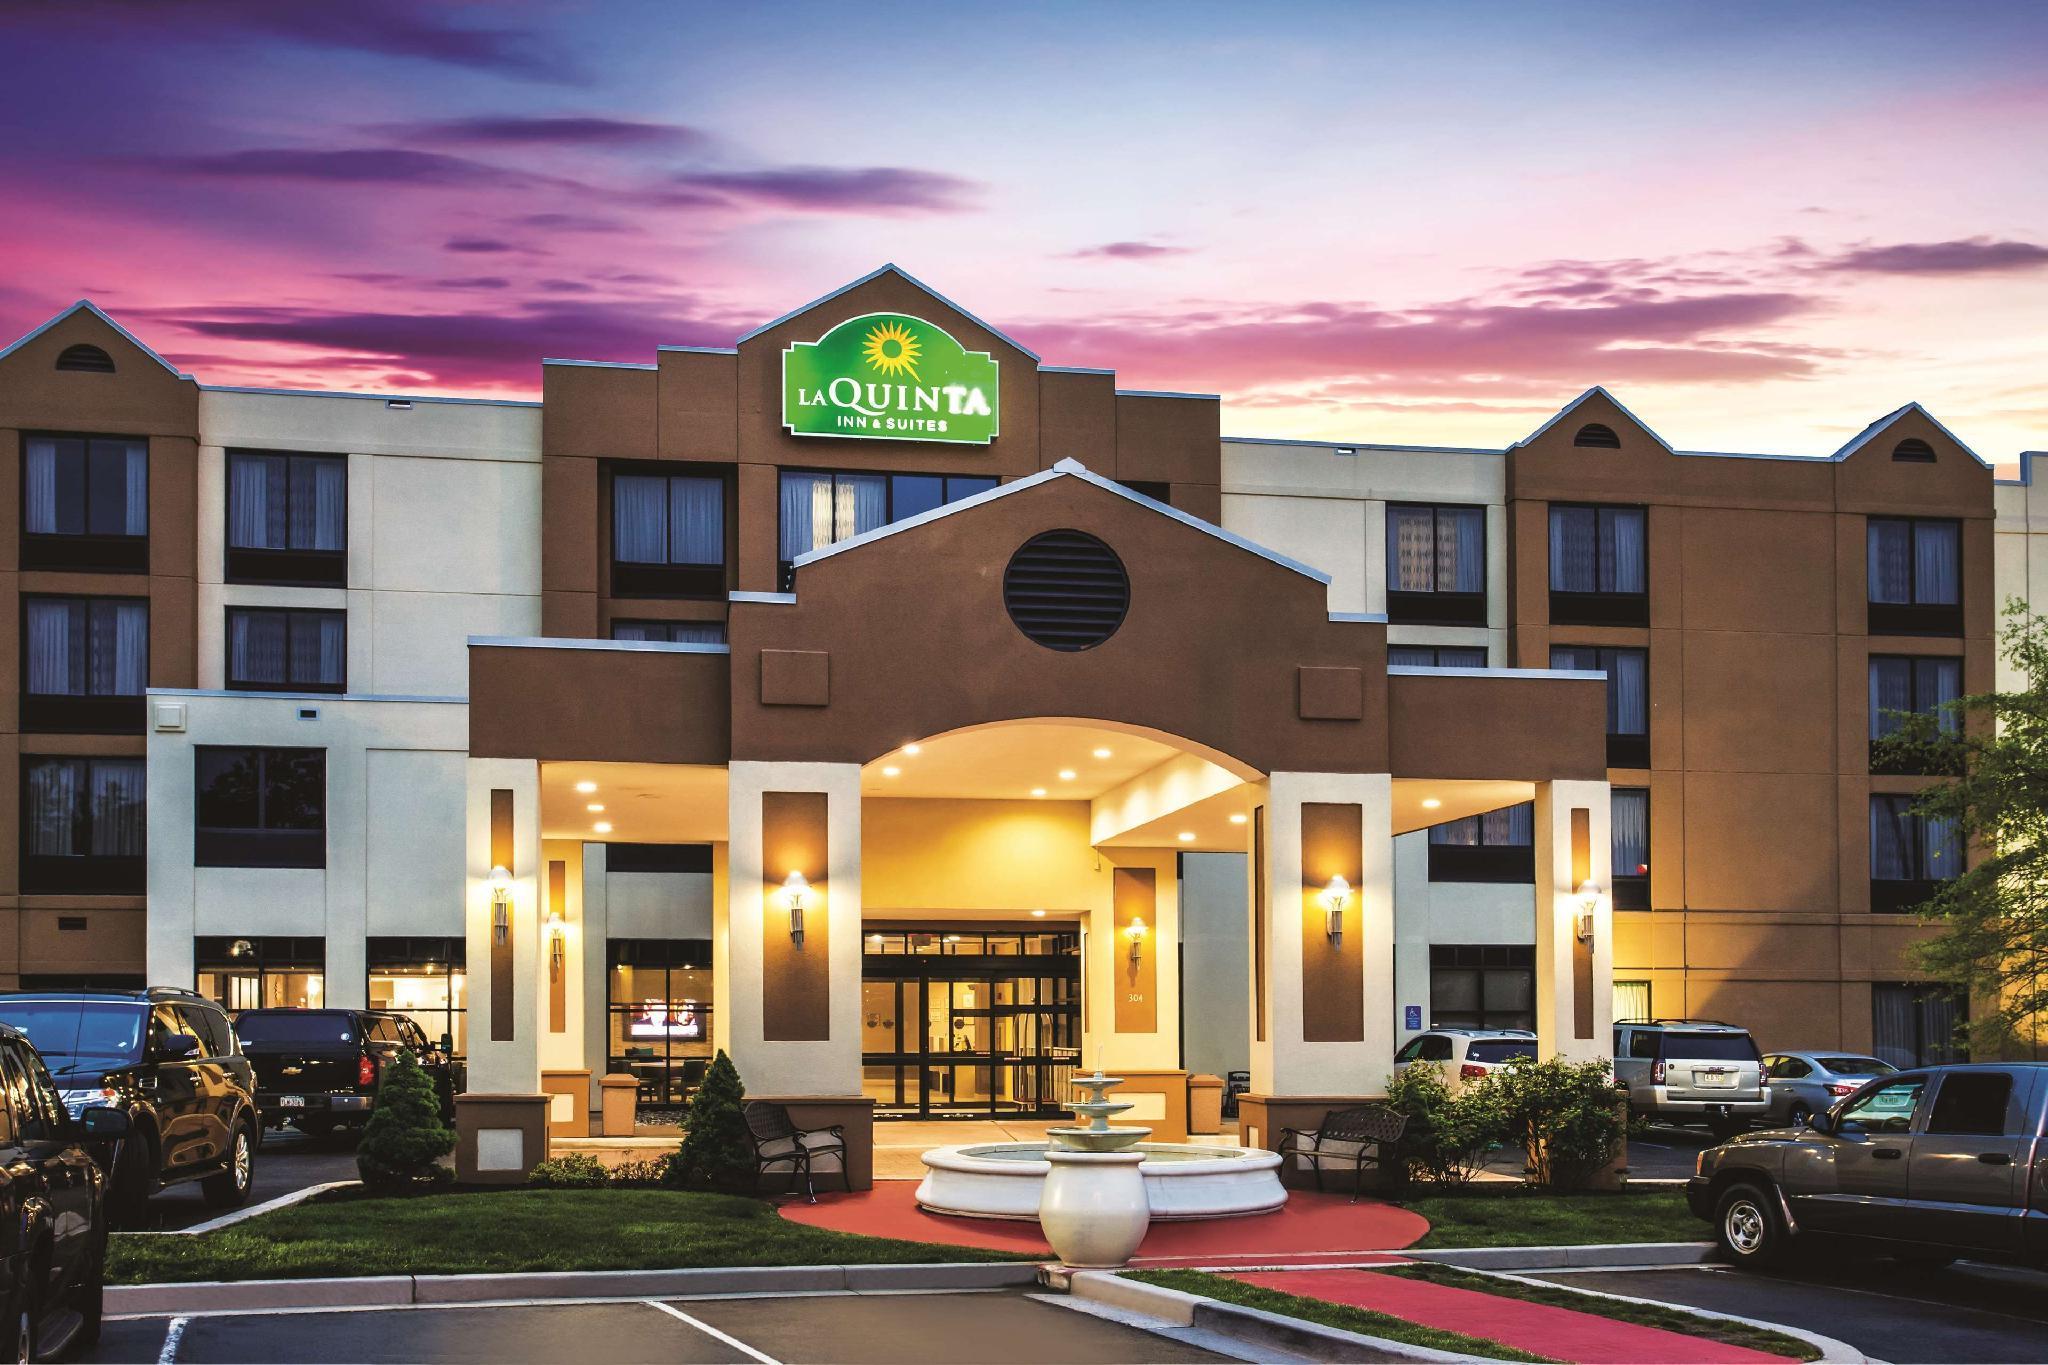 La Quinta Inn And Suites By Wyndham Newark   Elkton